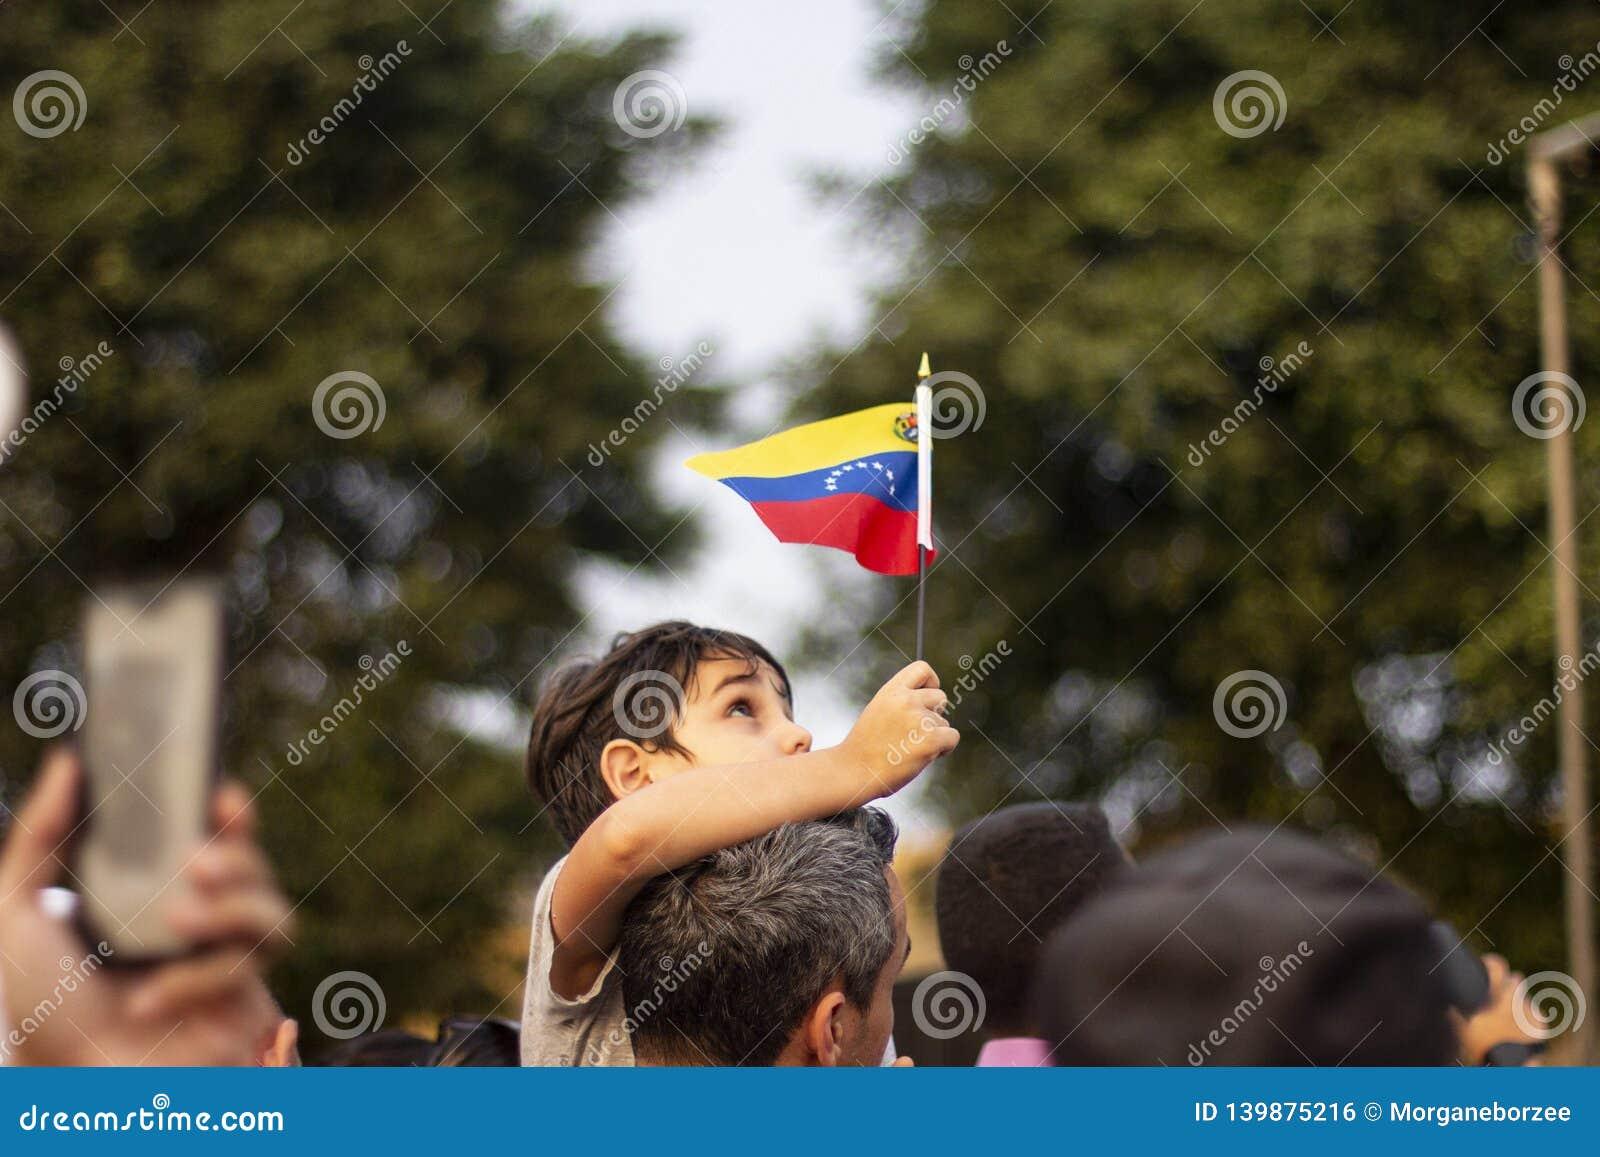 Lima, Lima / Peru - February 2 2019: Kid holding Venezuelan flag in protest against Nicolas Maduro